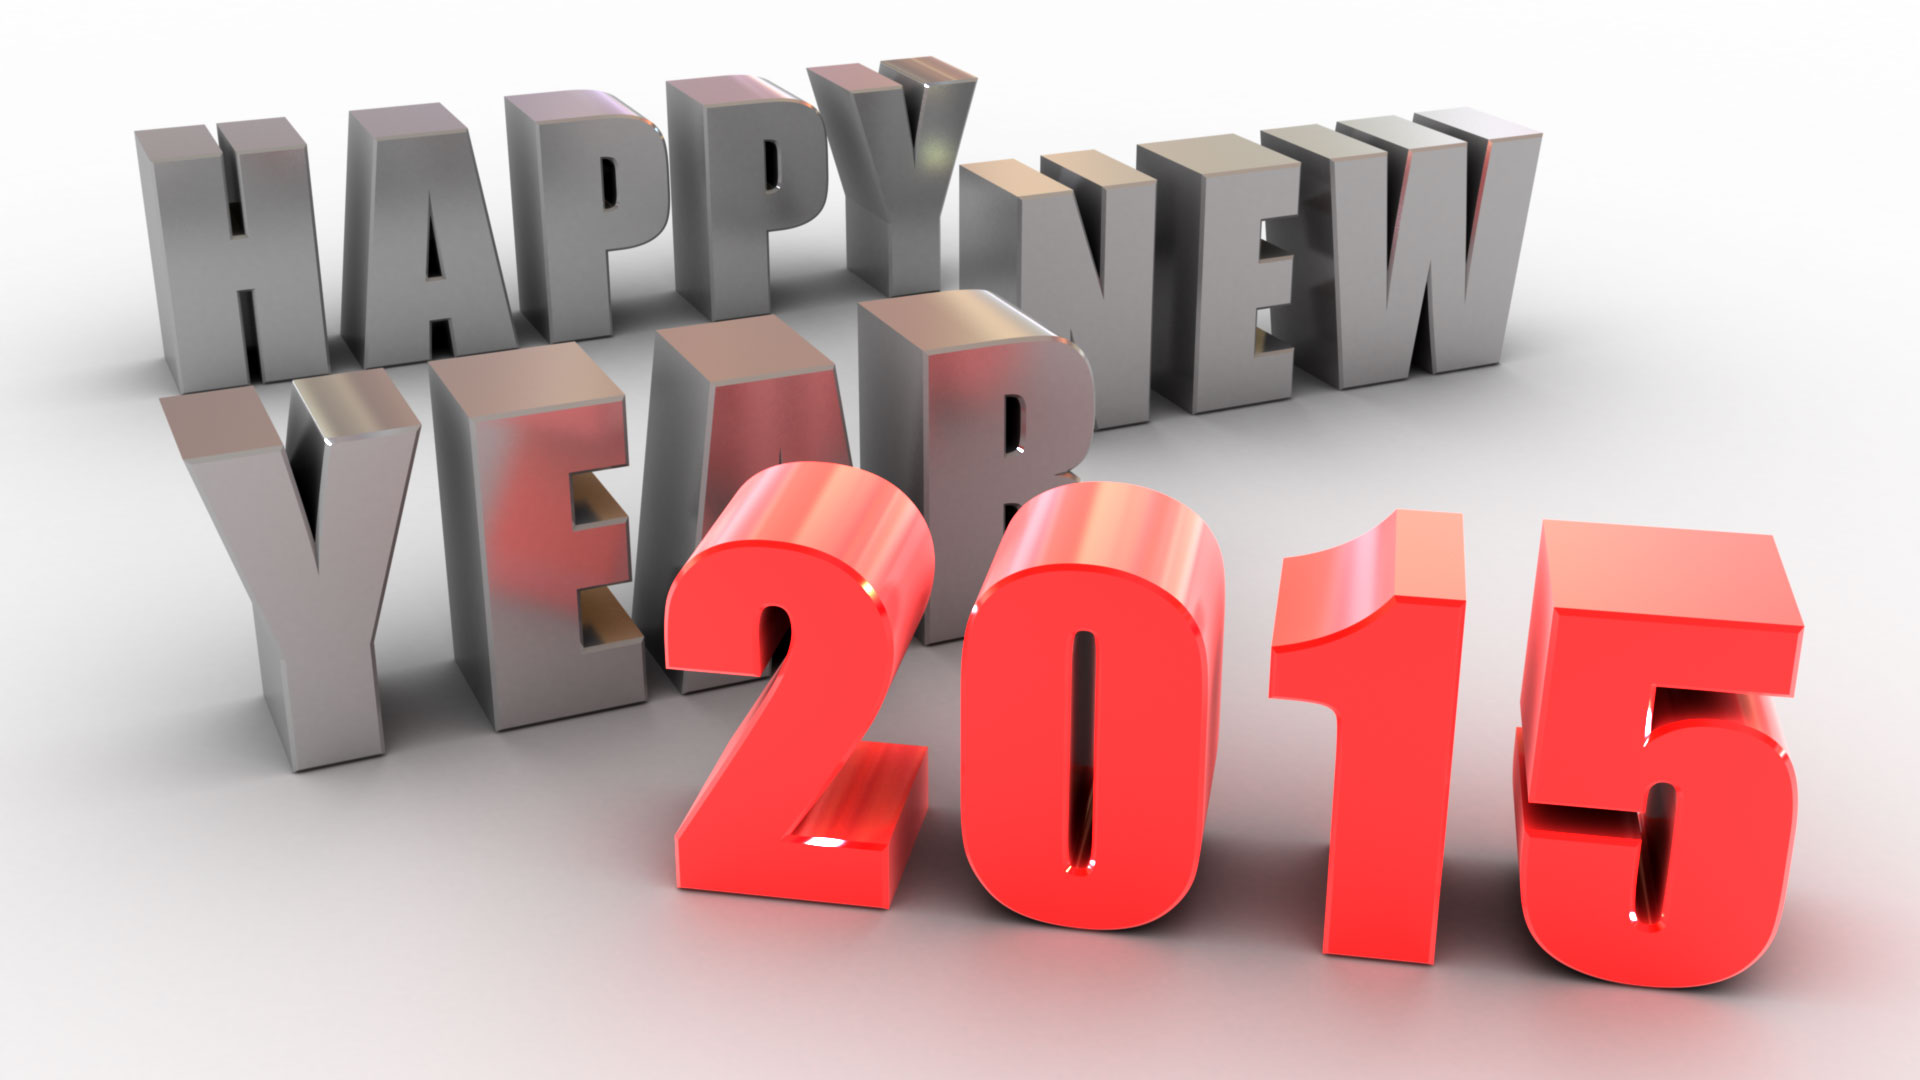 Happy new year 2015 3d wallpaper 1920x1080